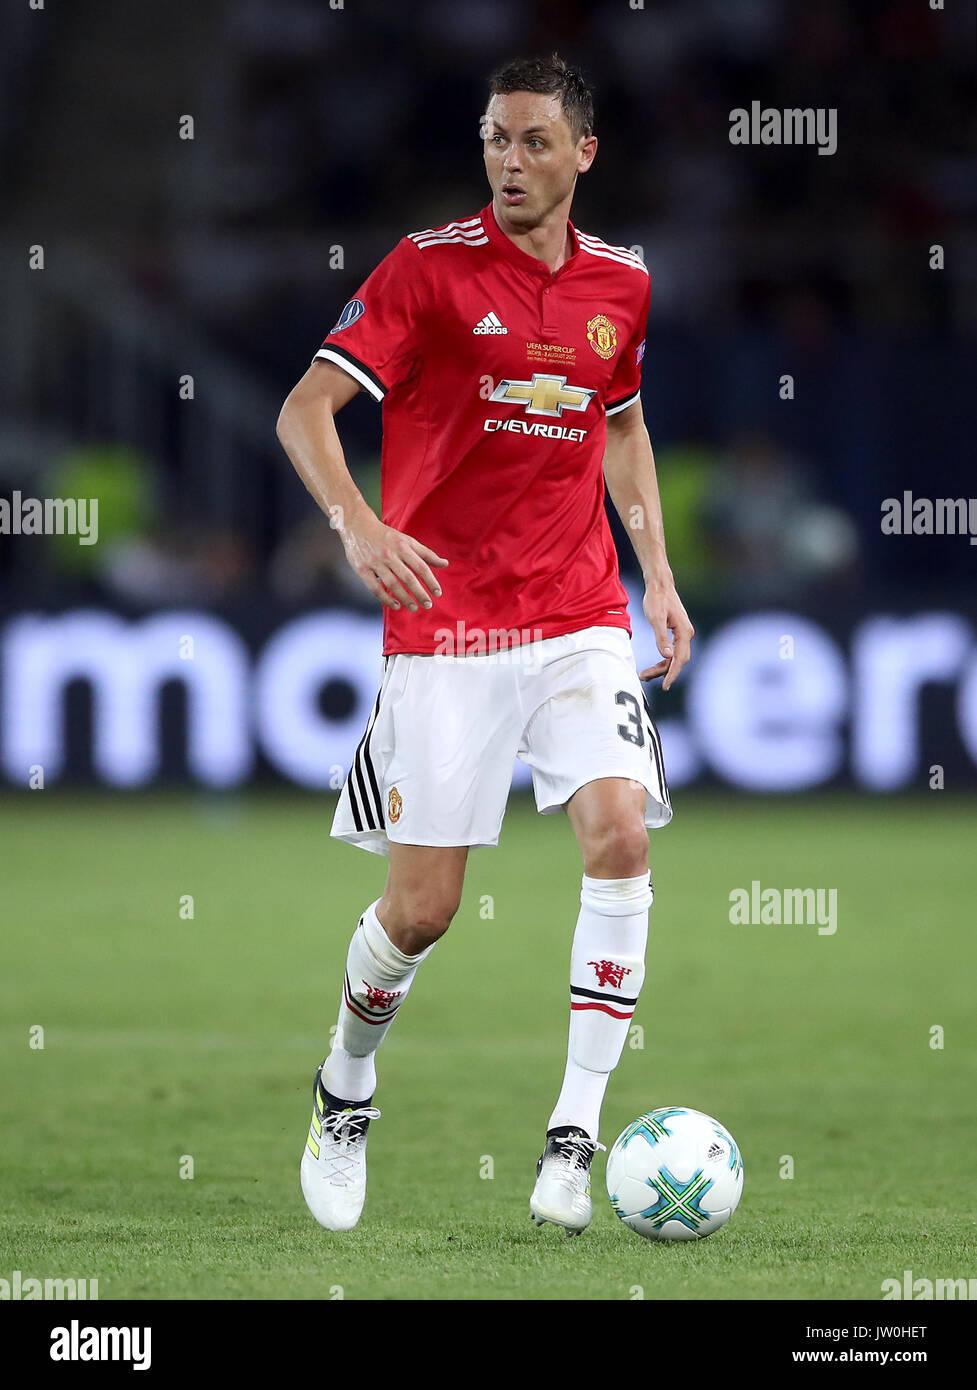 Nemanja Matic Manchester United Stock Royalty Free Image